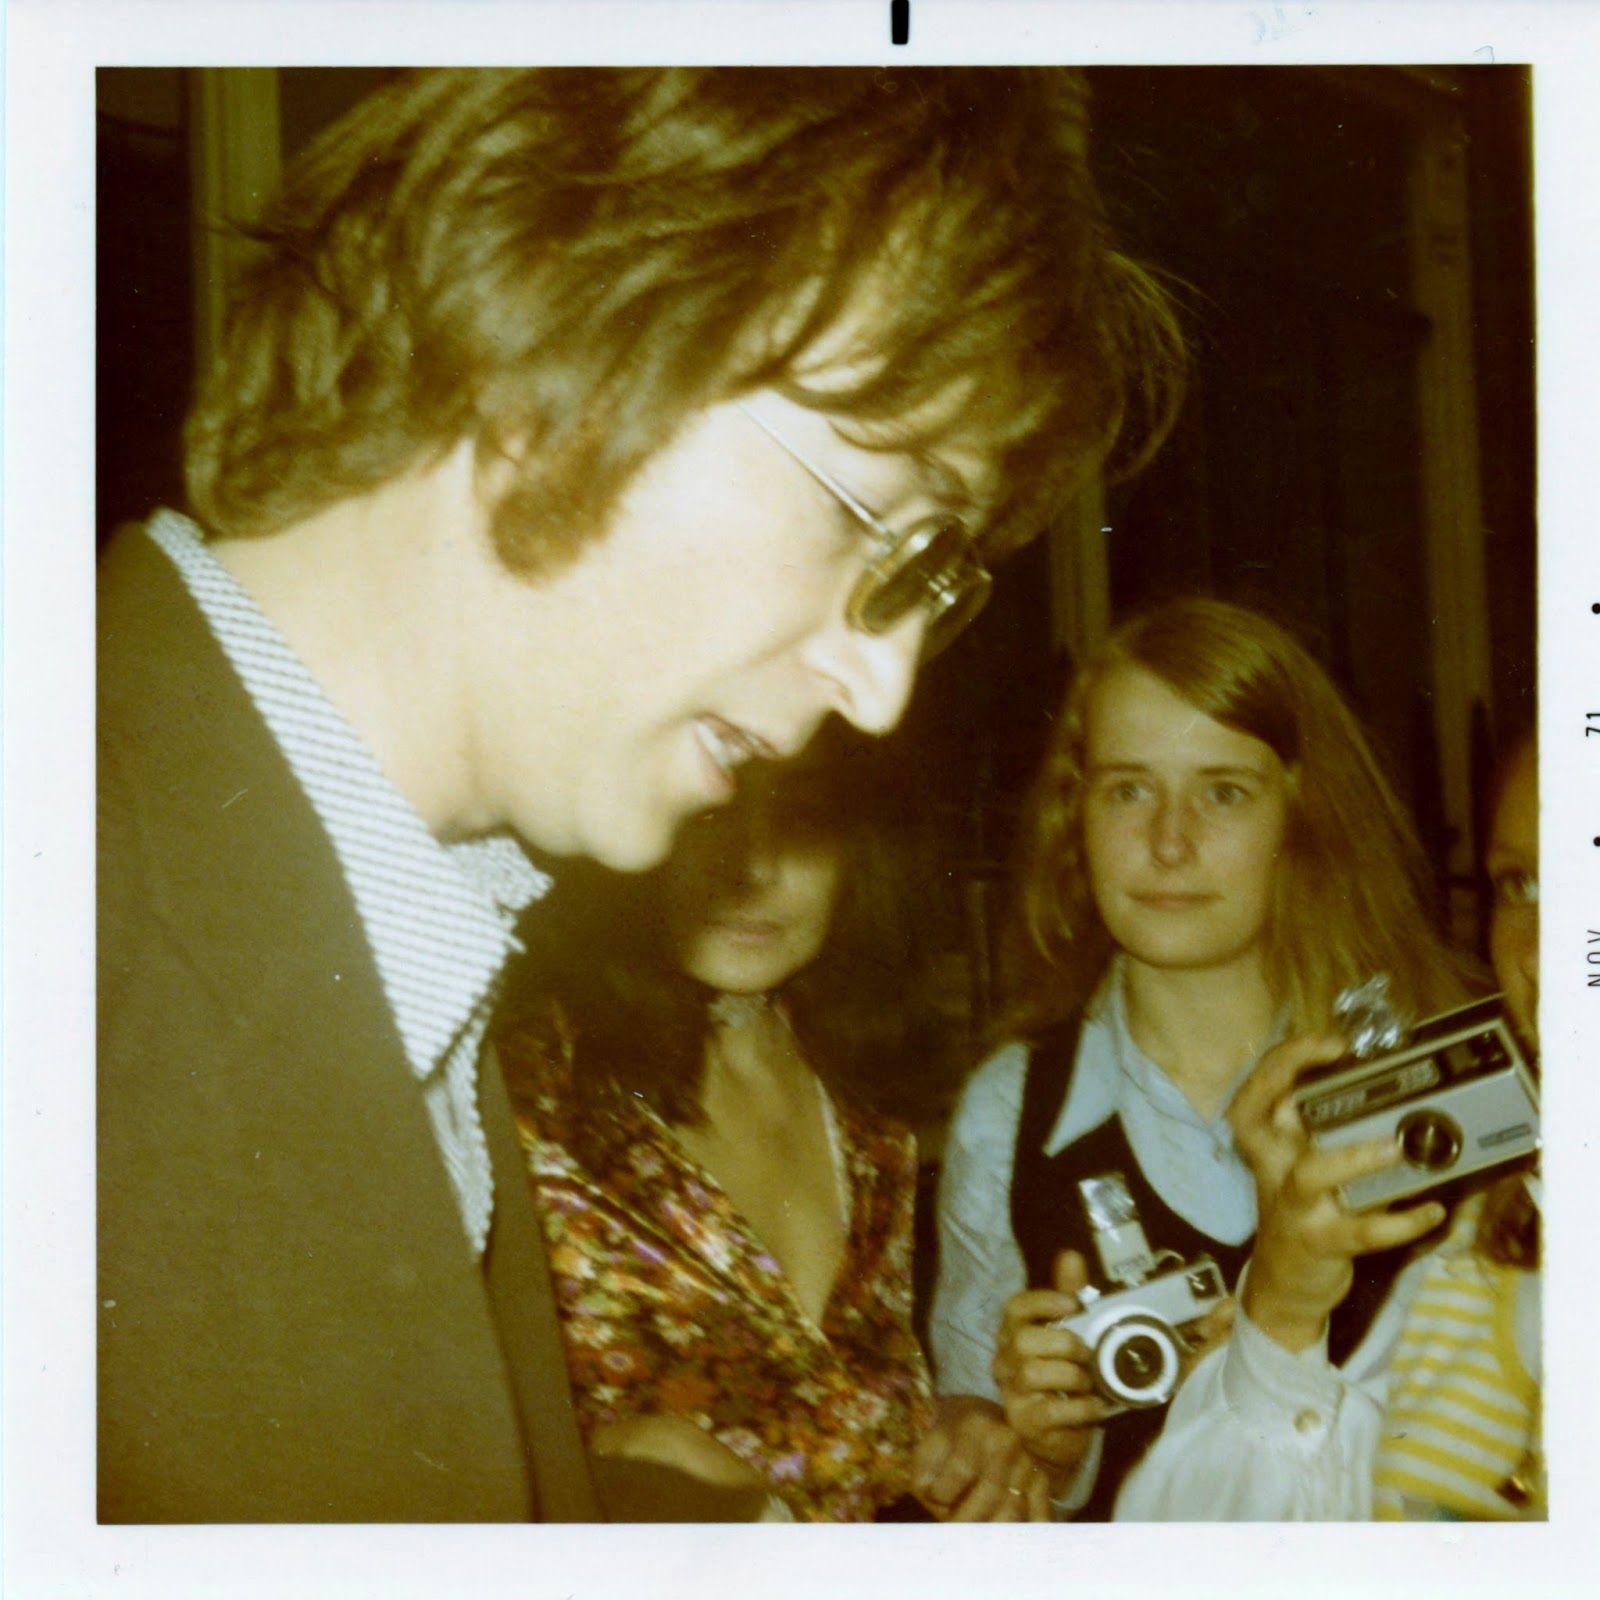 That look.... The beatles, John lennon, Lennon